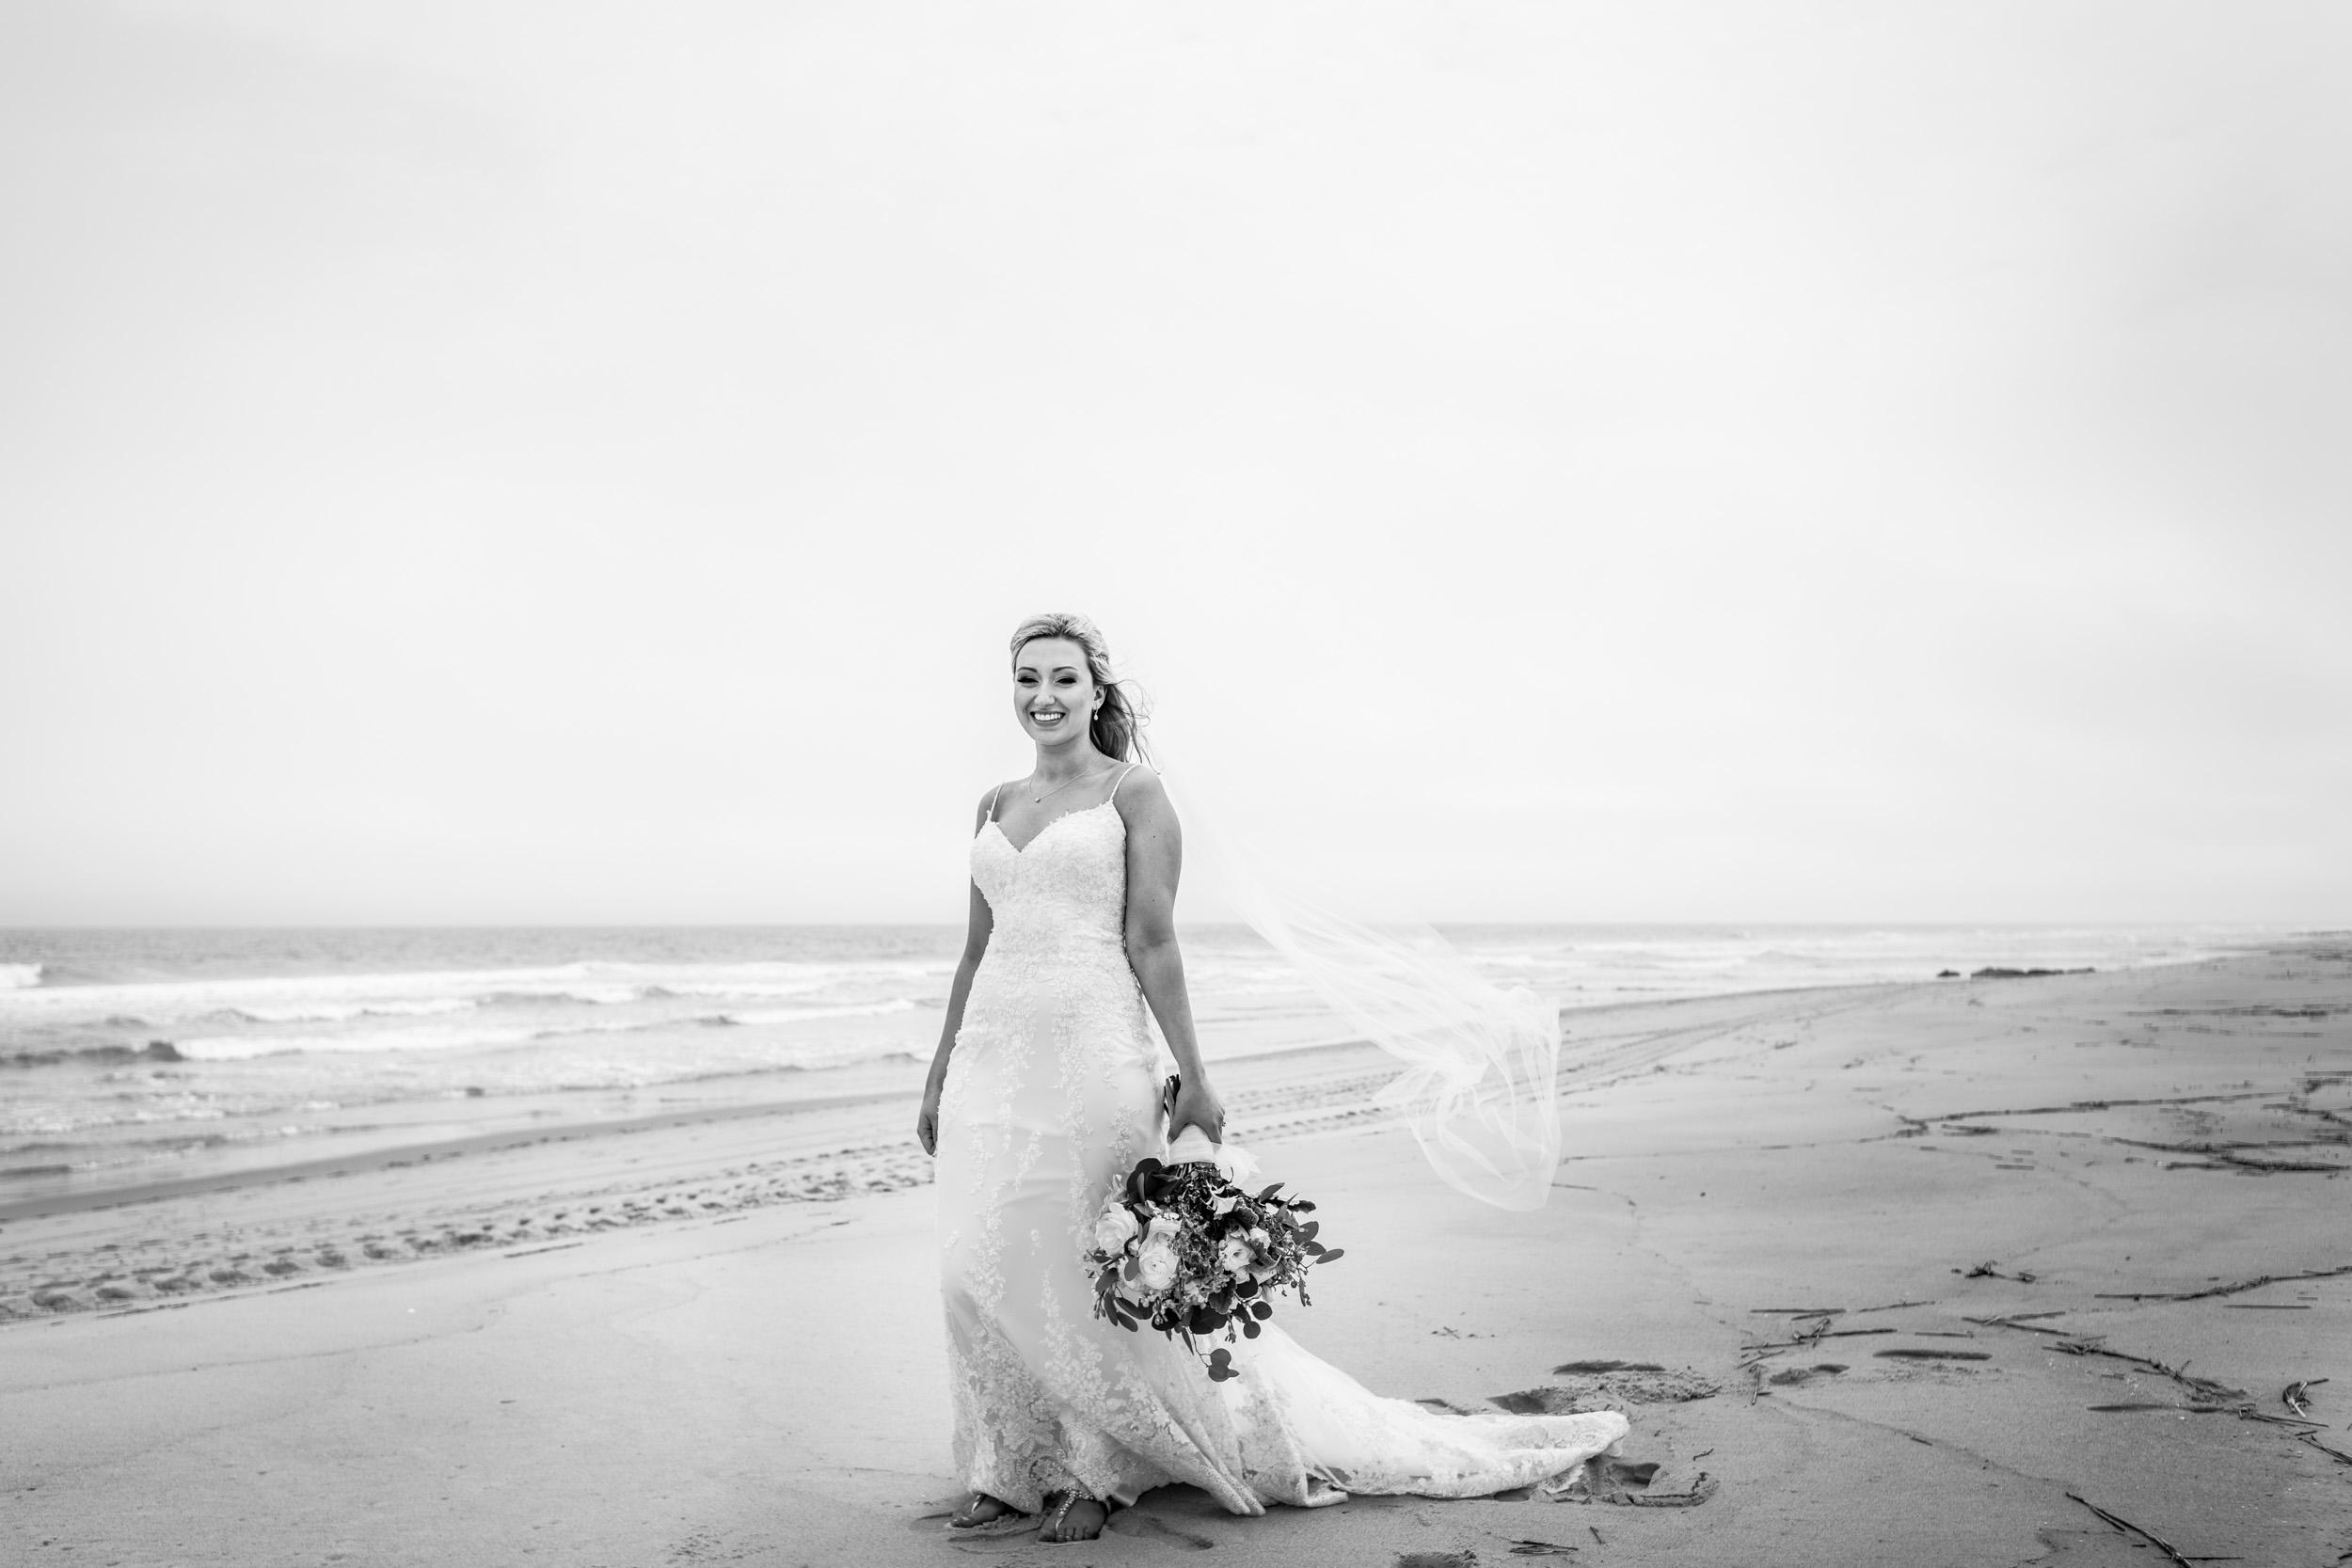 The Seashell Long Beach Island Bridal Photos